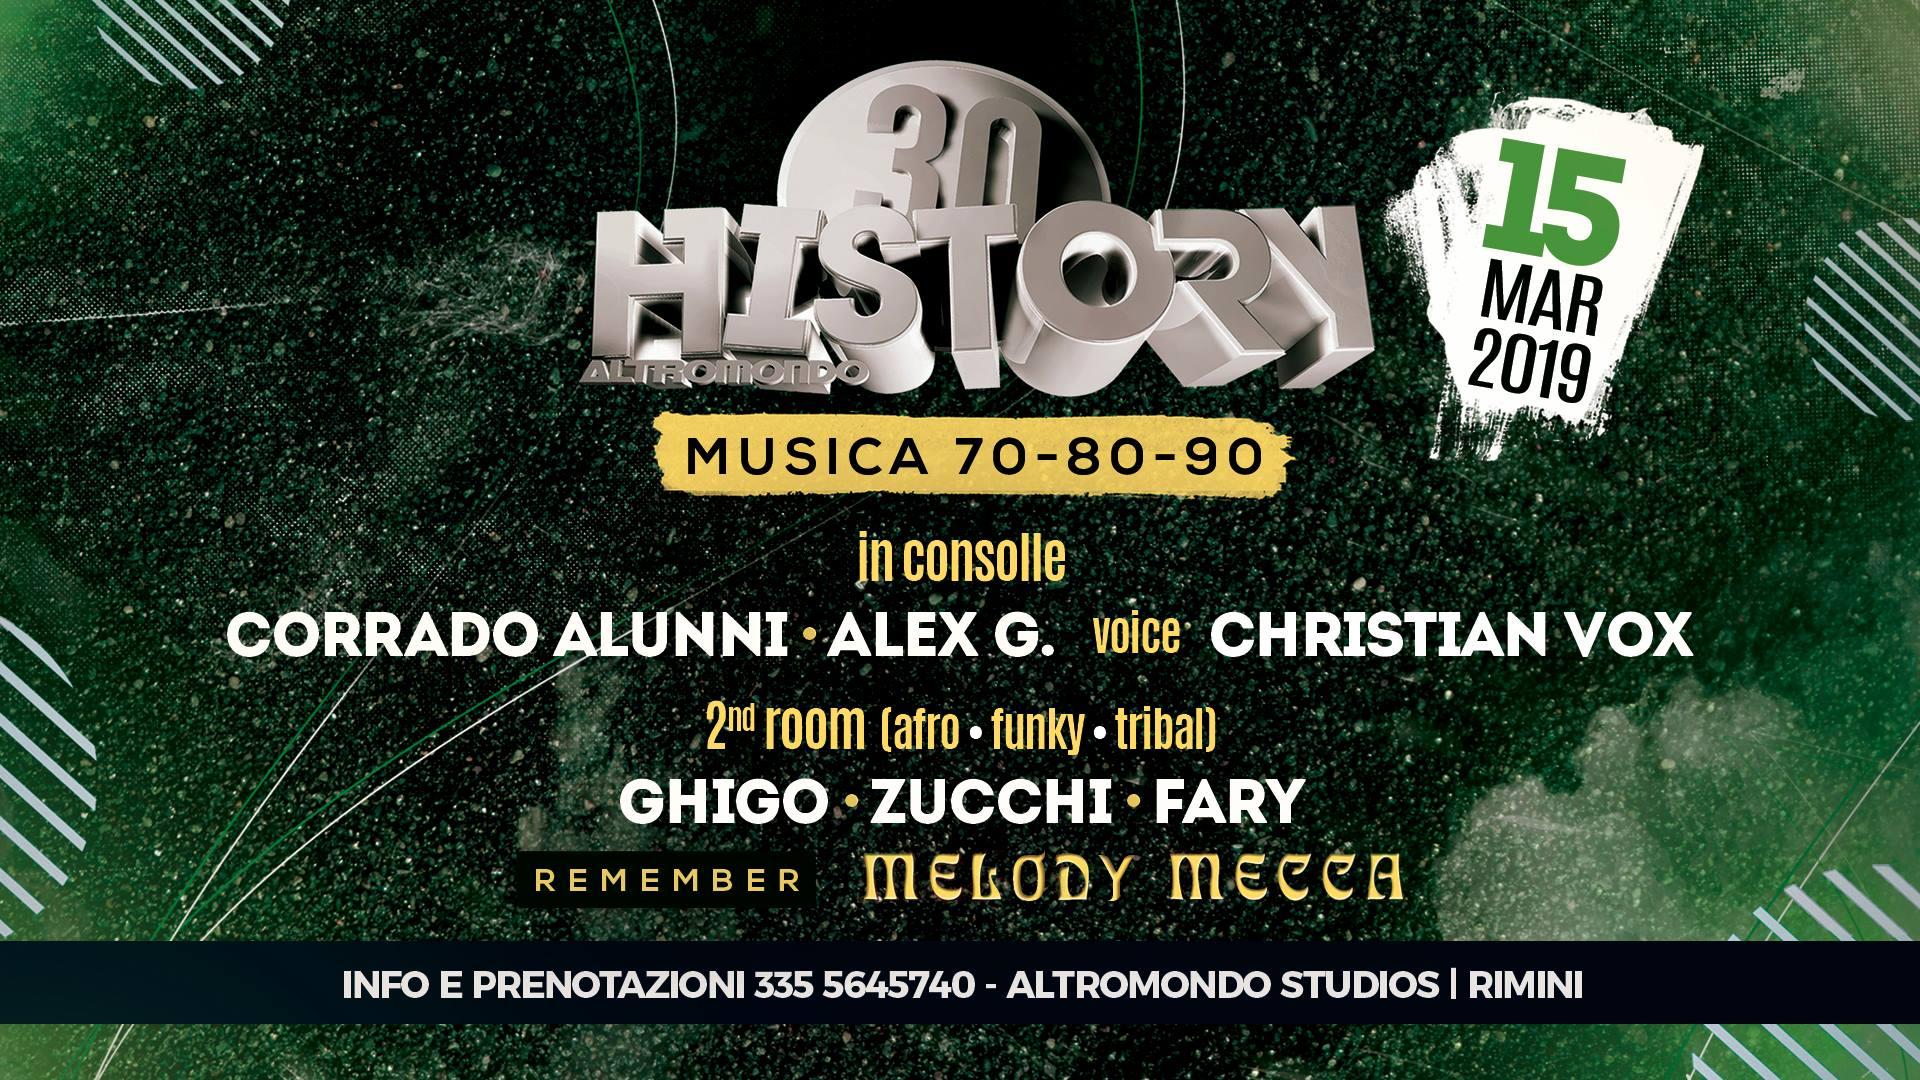 History 70 80 90 Discoteca Altromondo Rimini